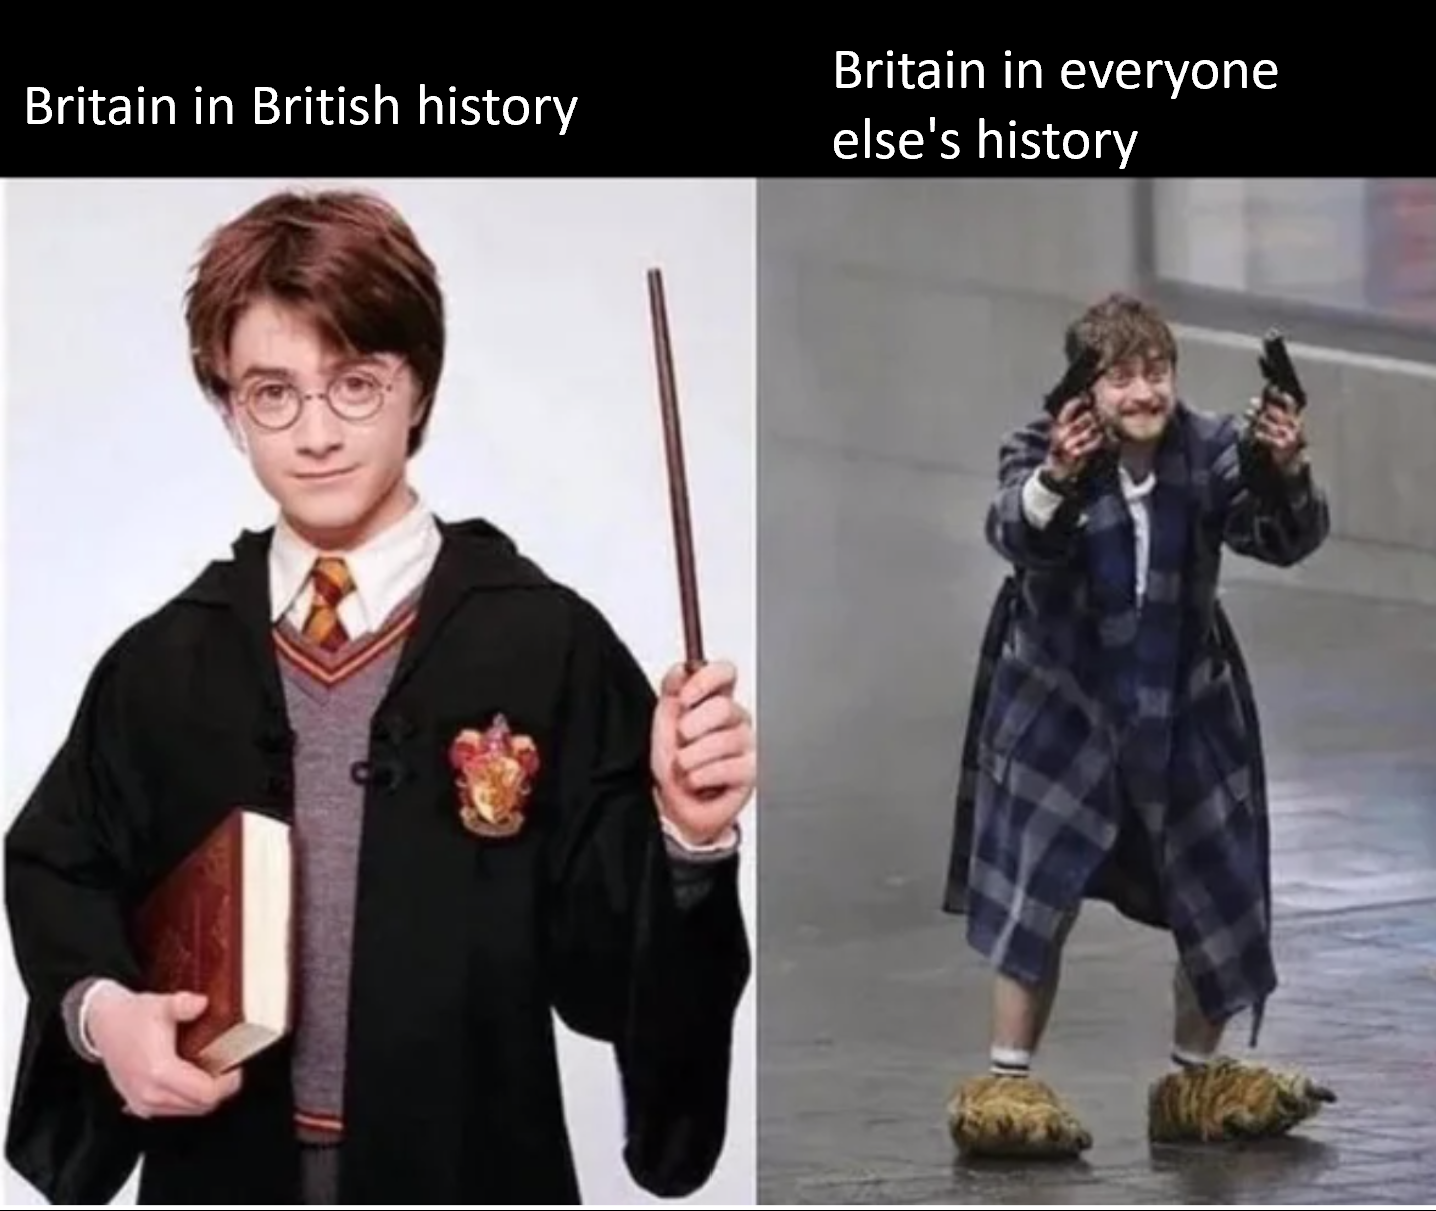 history memes, history meme, historical memes, funny history memes, funny historical memes, best history memes